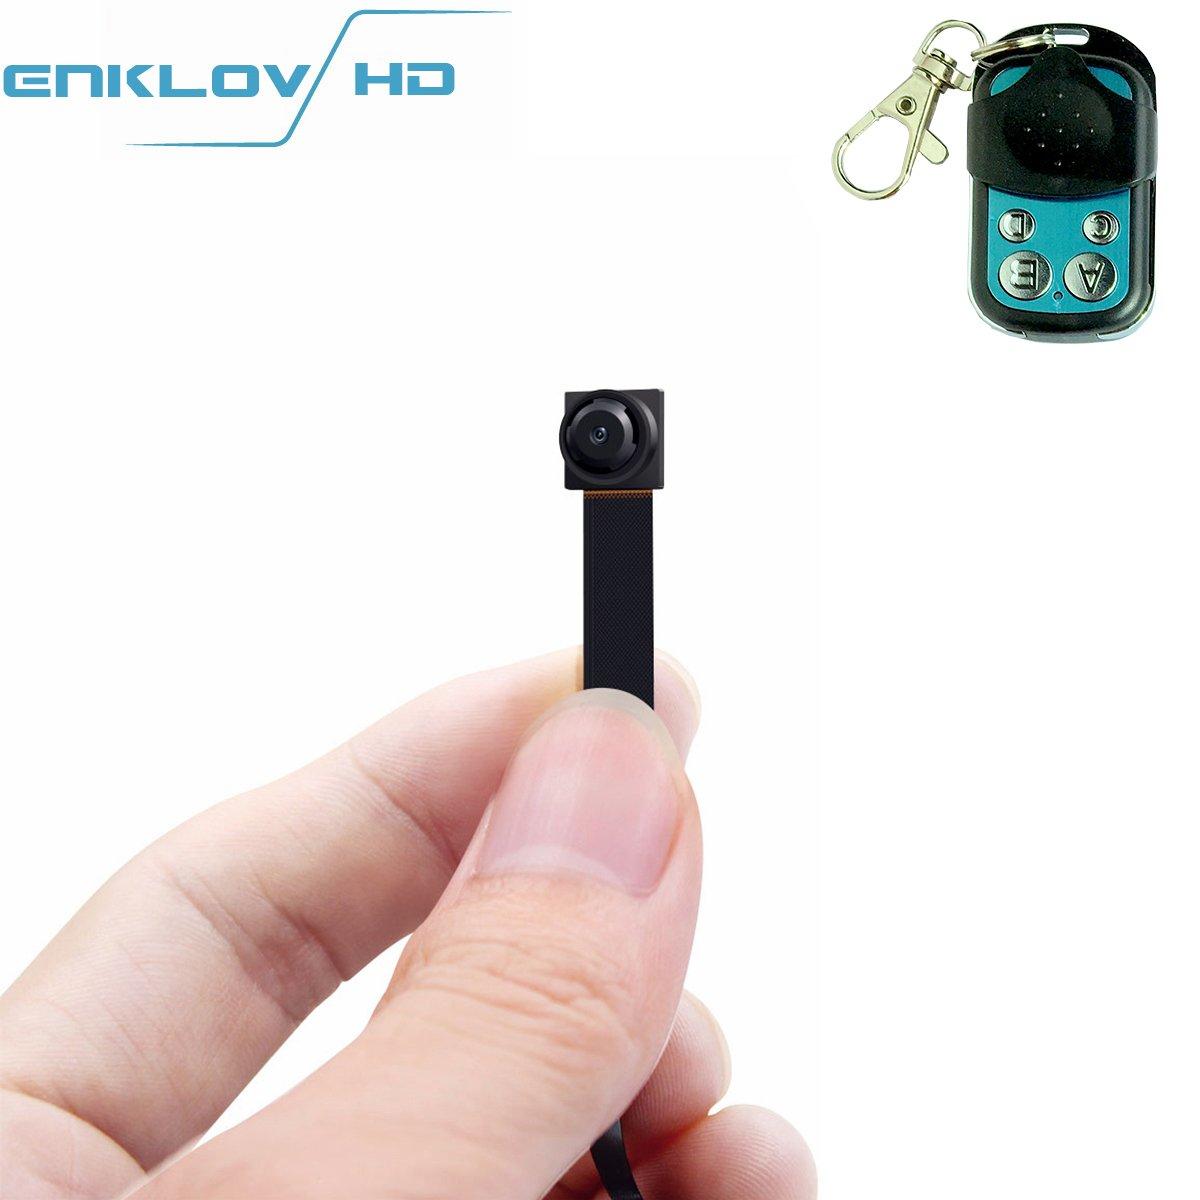 Security Spy Cameras Hidden: 1080P Portable Mini Hidden Spy Camera ENKLOV Video